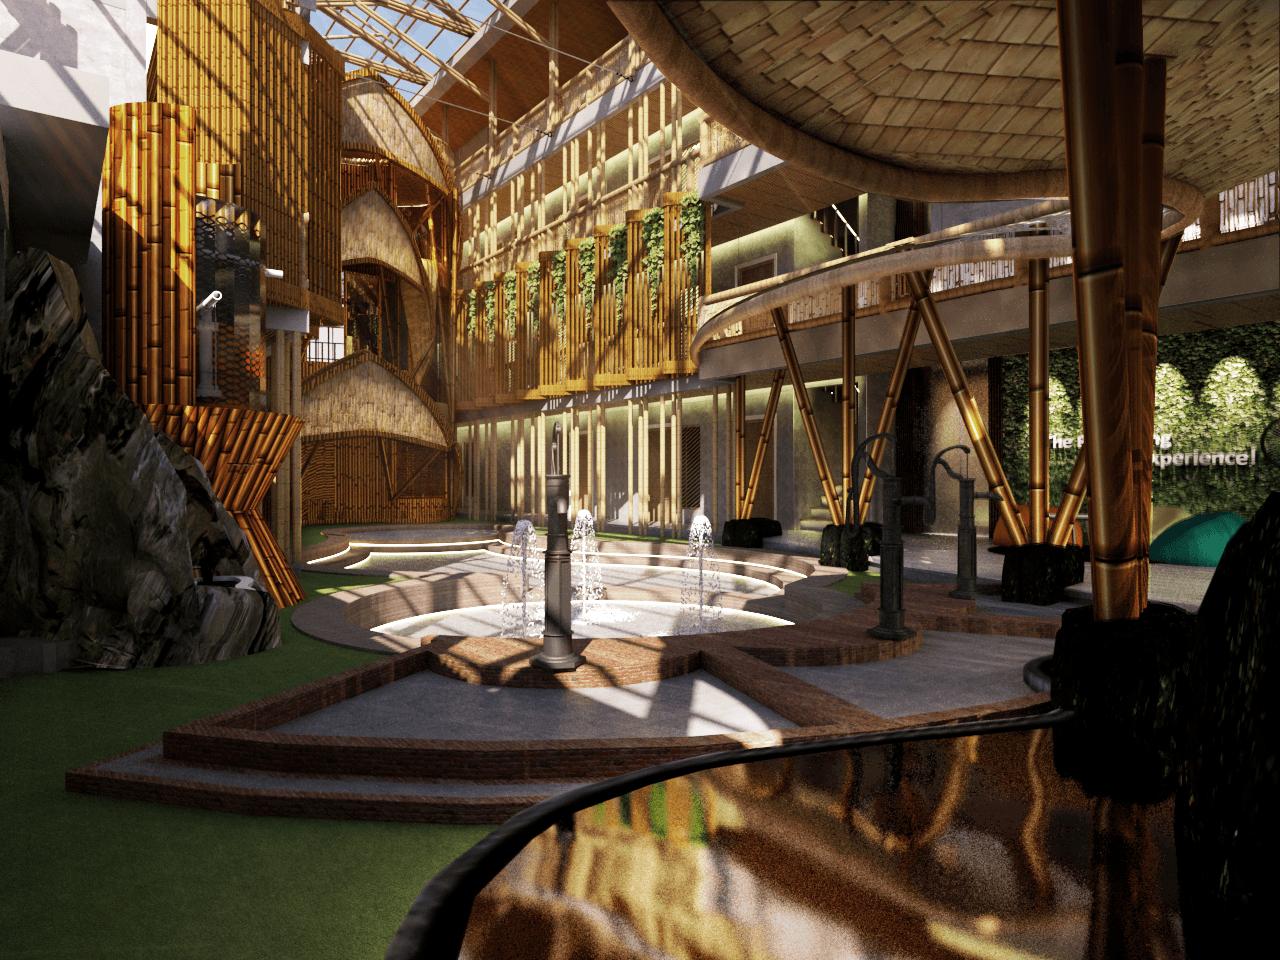 Jasa Design and Build Aesthetic-In Atelier di Yogyakarta